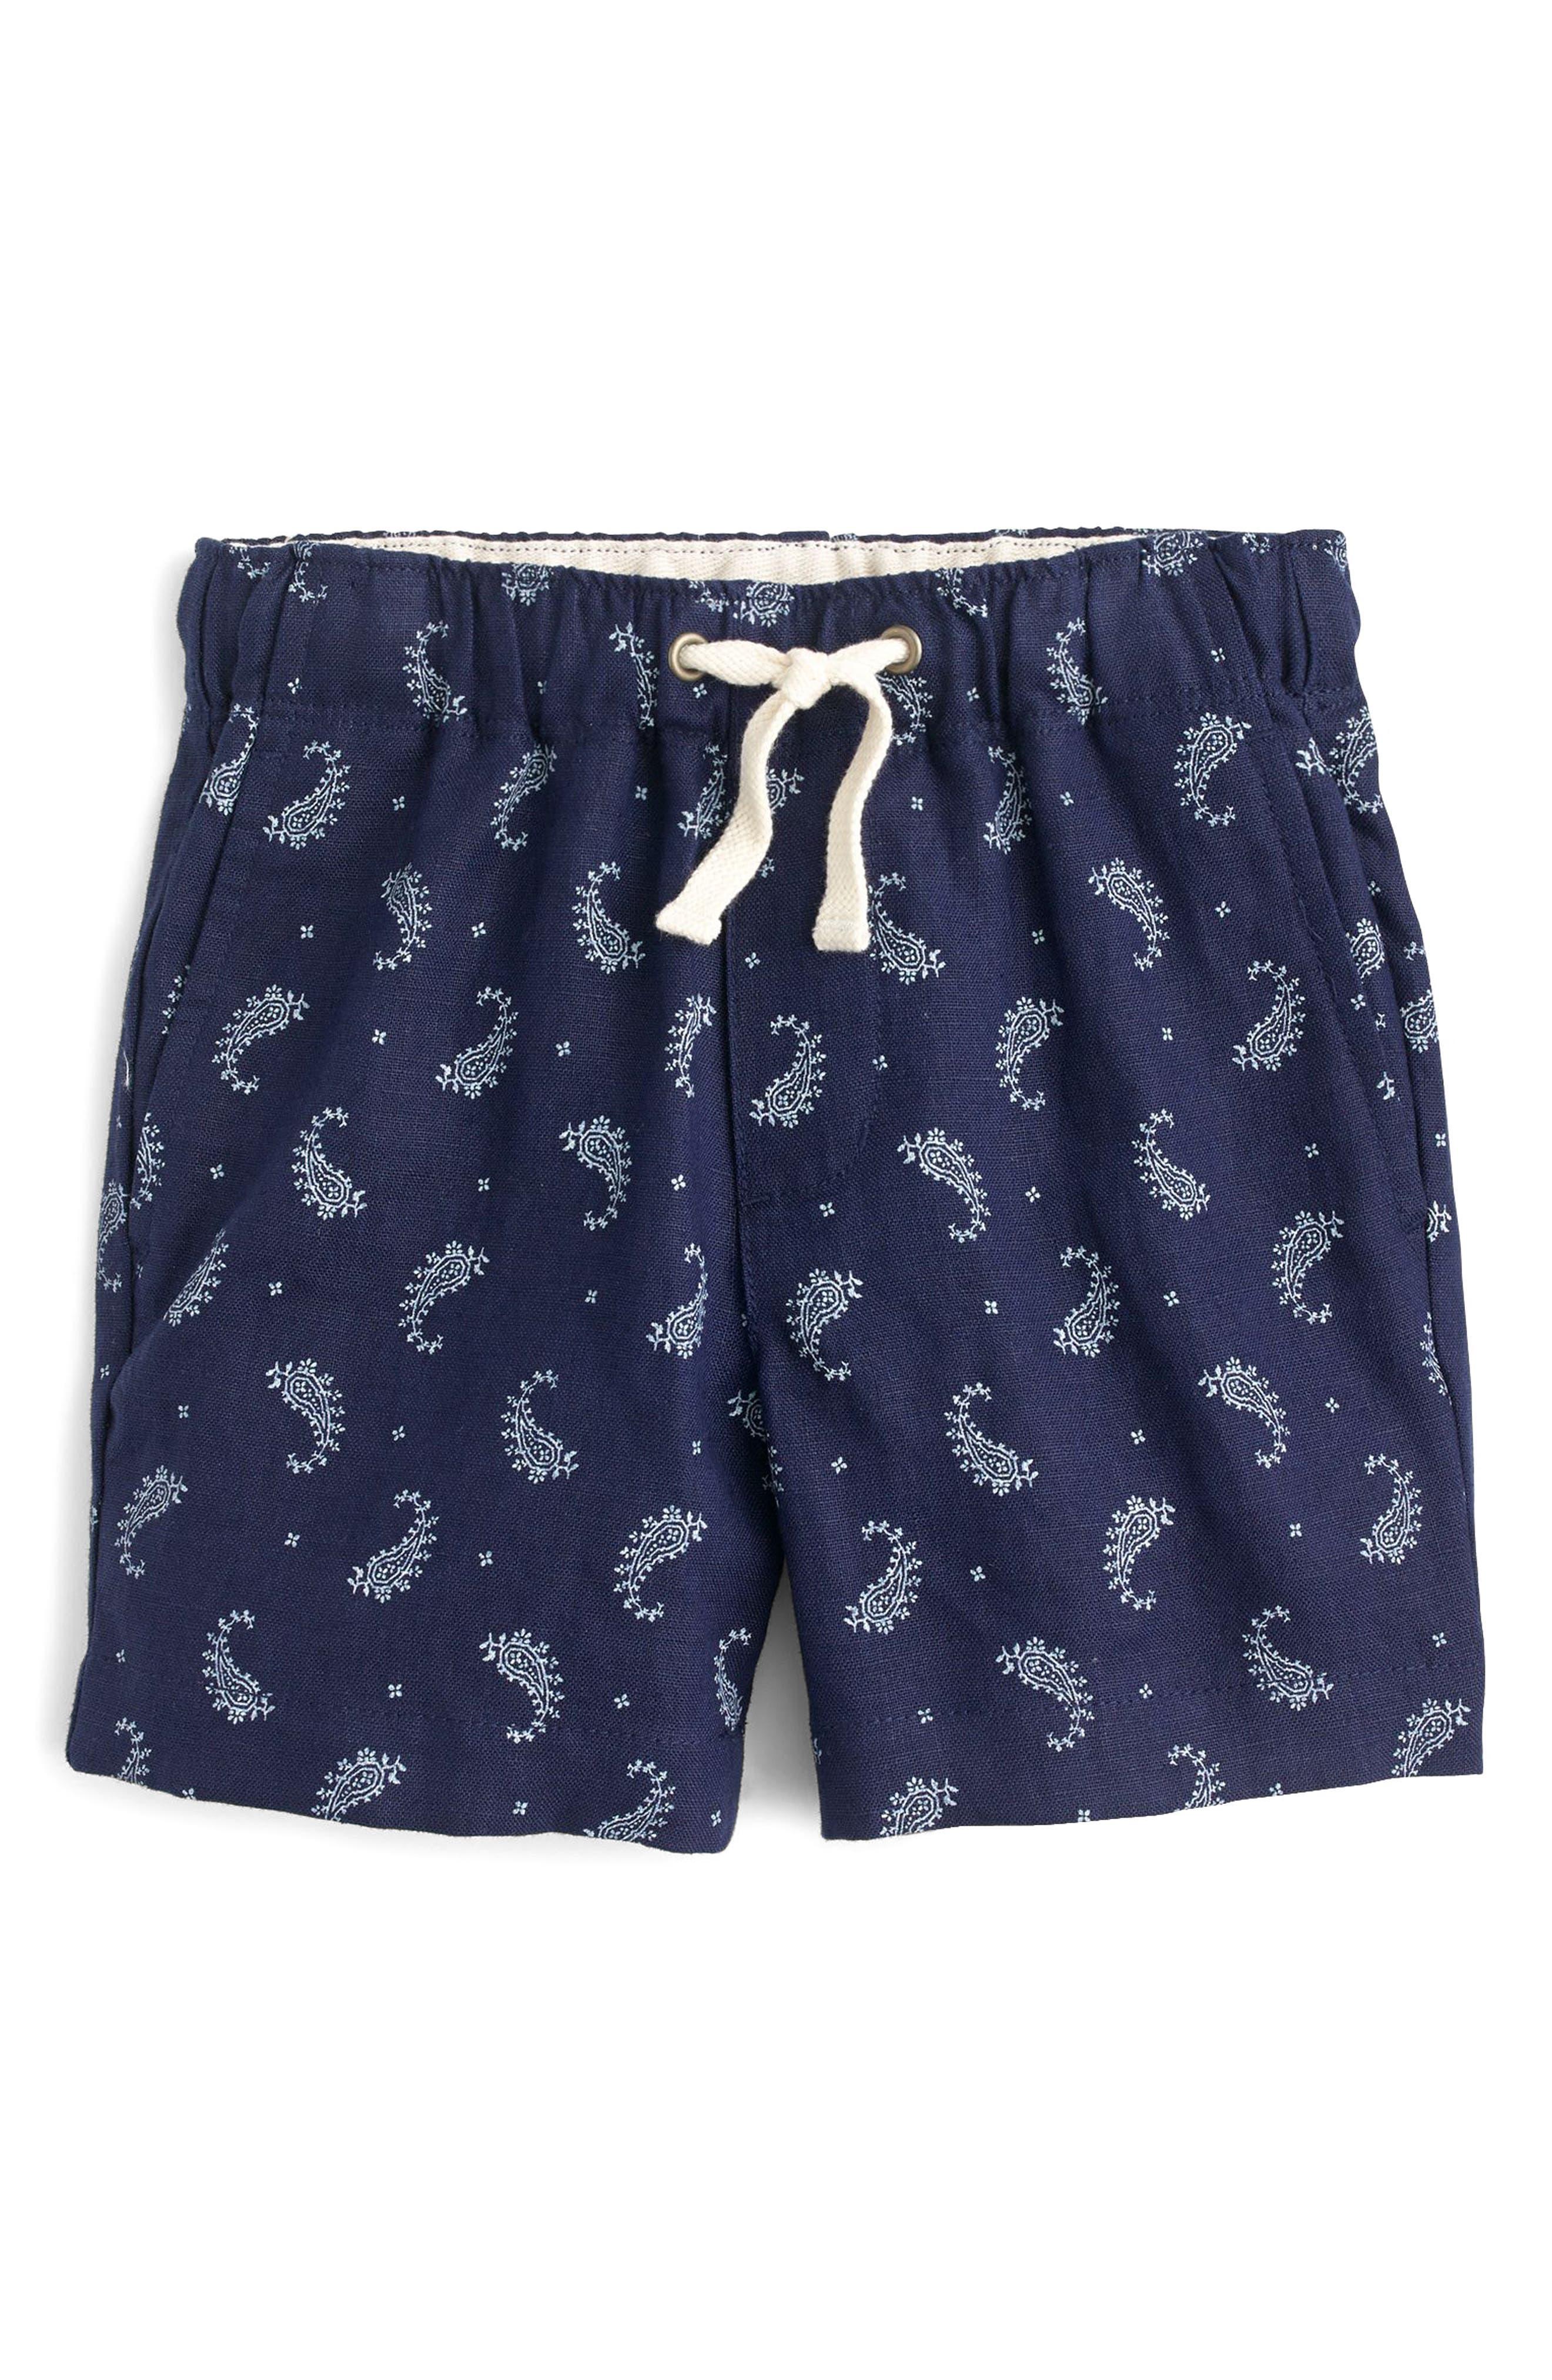 Paisley Dock Shorts,                             Main thumbnail 1, color,                             Indigo Bandana